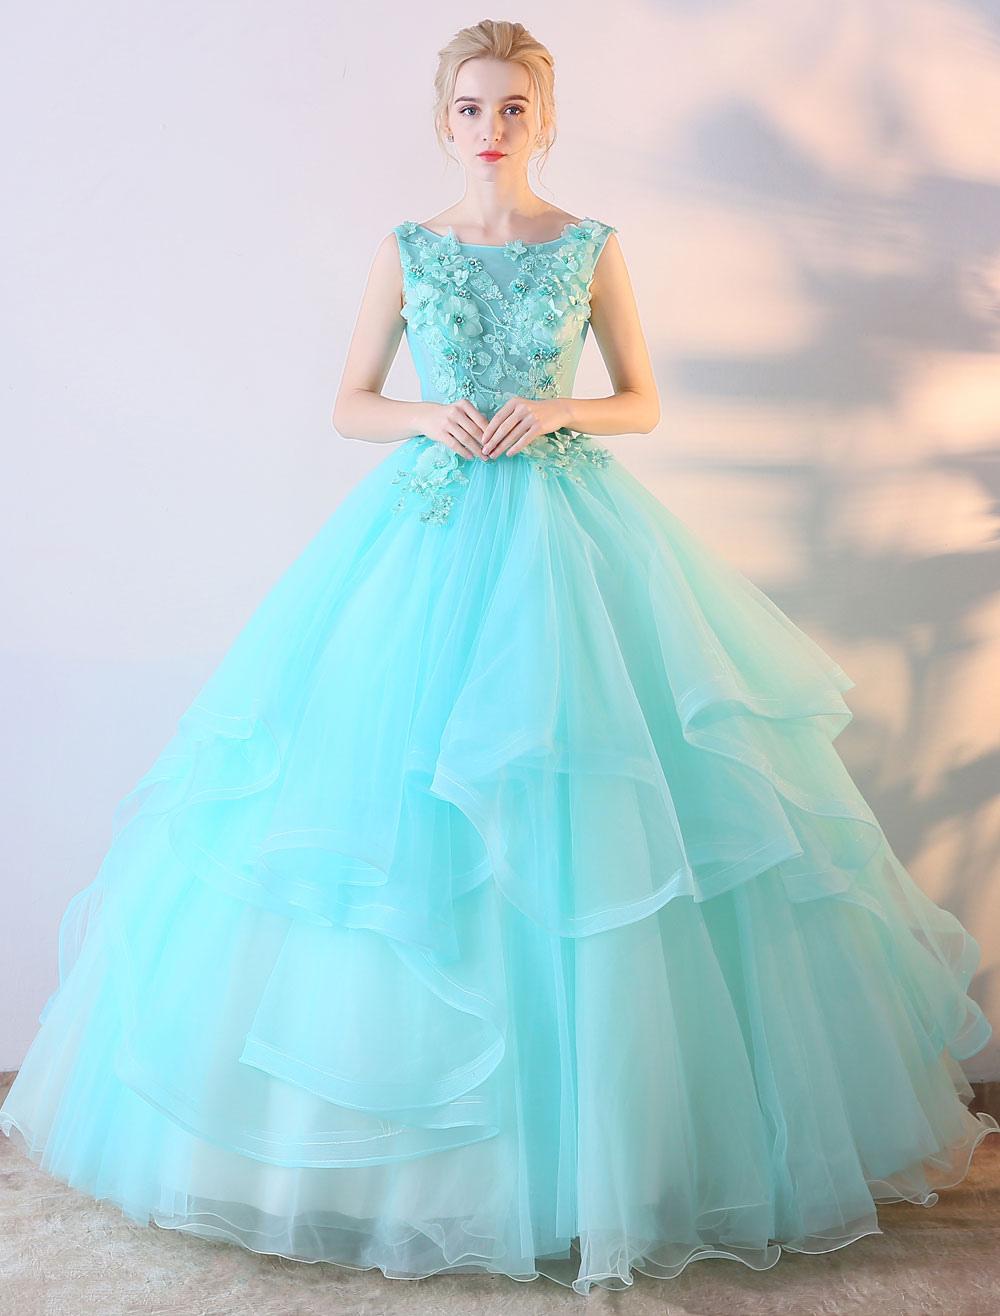 Mint Green Prom Dress Ball Gown Flowers Applique Colored Wedding Dress Floor Length Quinceanera Dress (Cheap Party Dress) photo